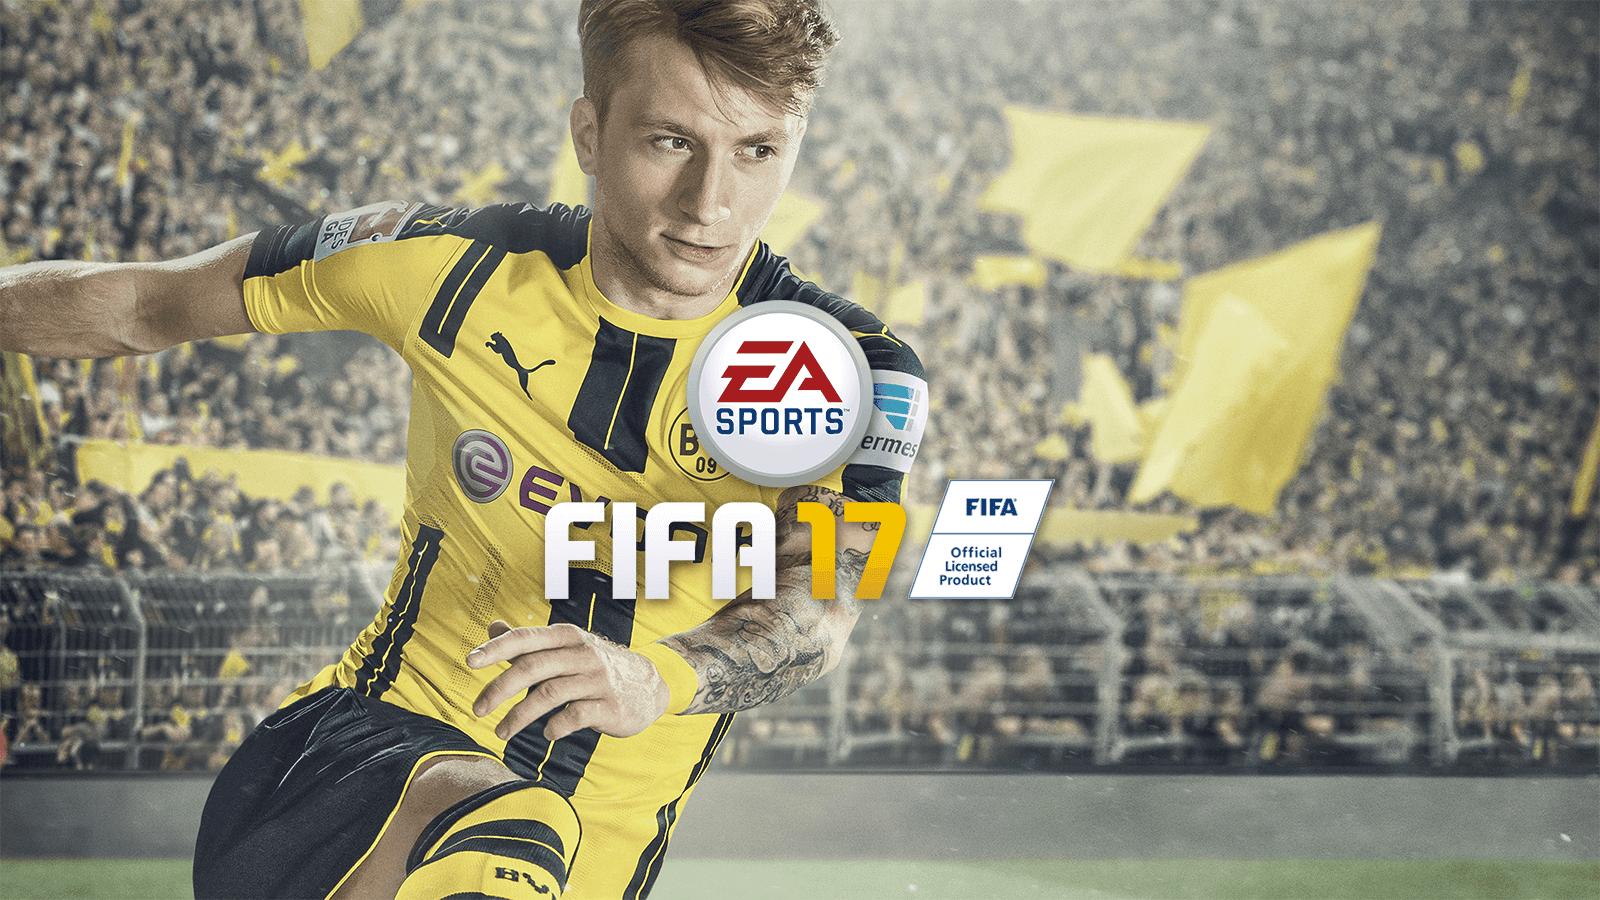 fifa 2017 FIFA 17 Oyun İnceleme FIFA 17 Oyun İnceleme fifa 2017